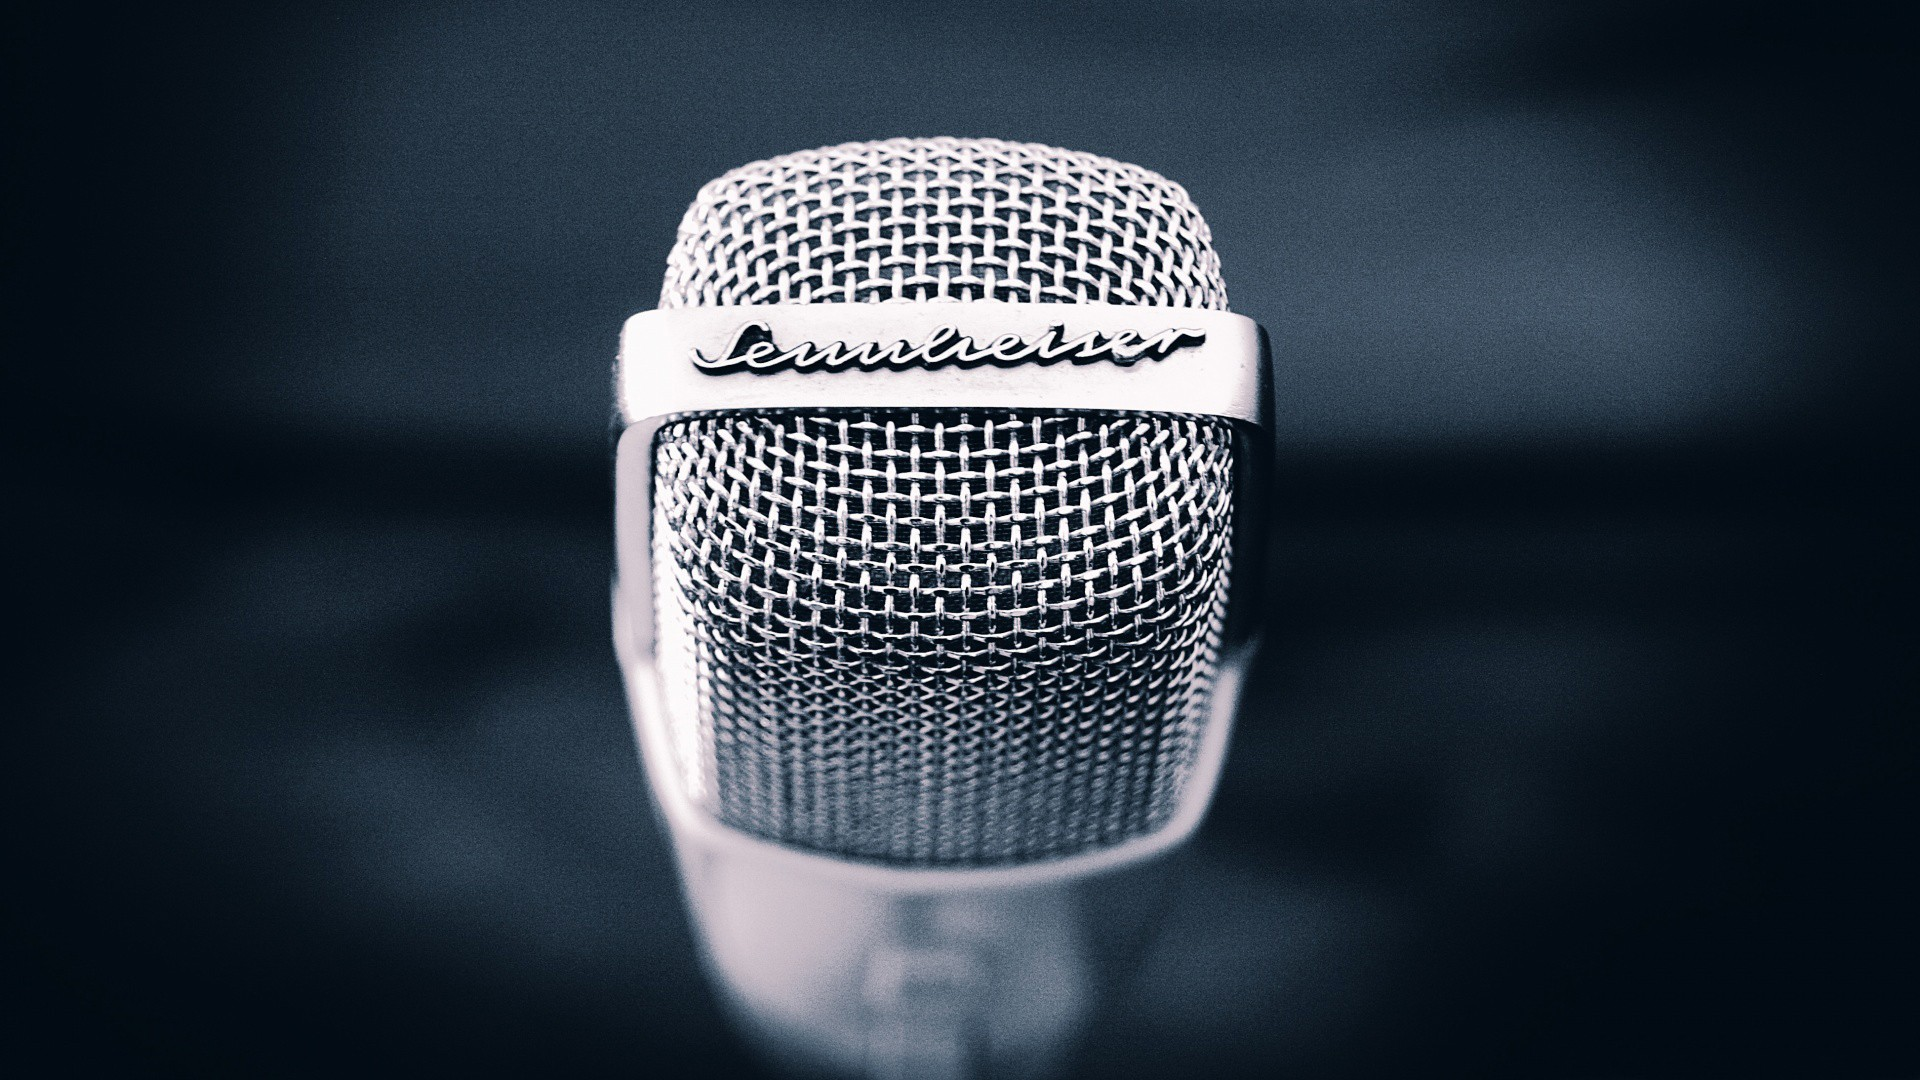 free microphone wallpaper 34321